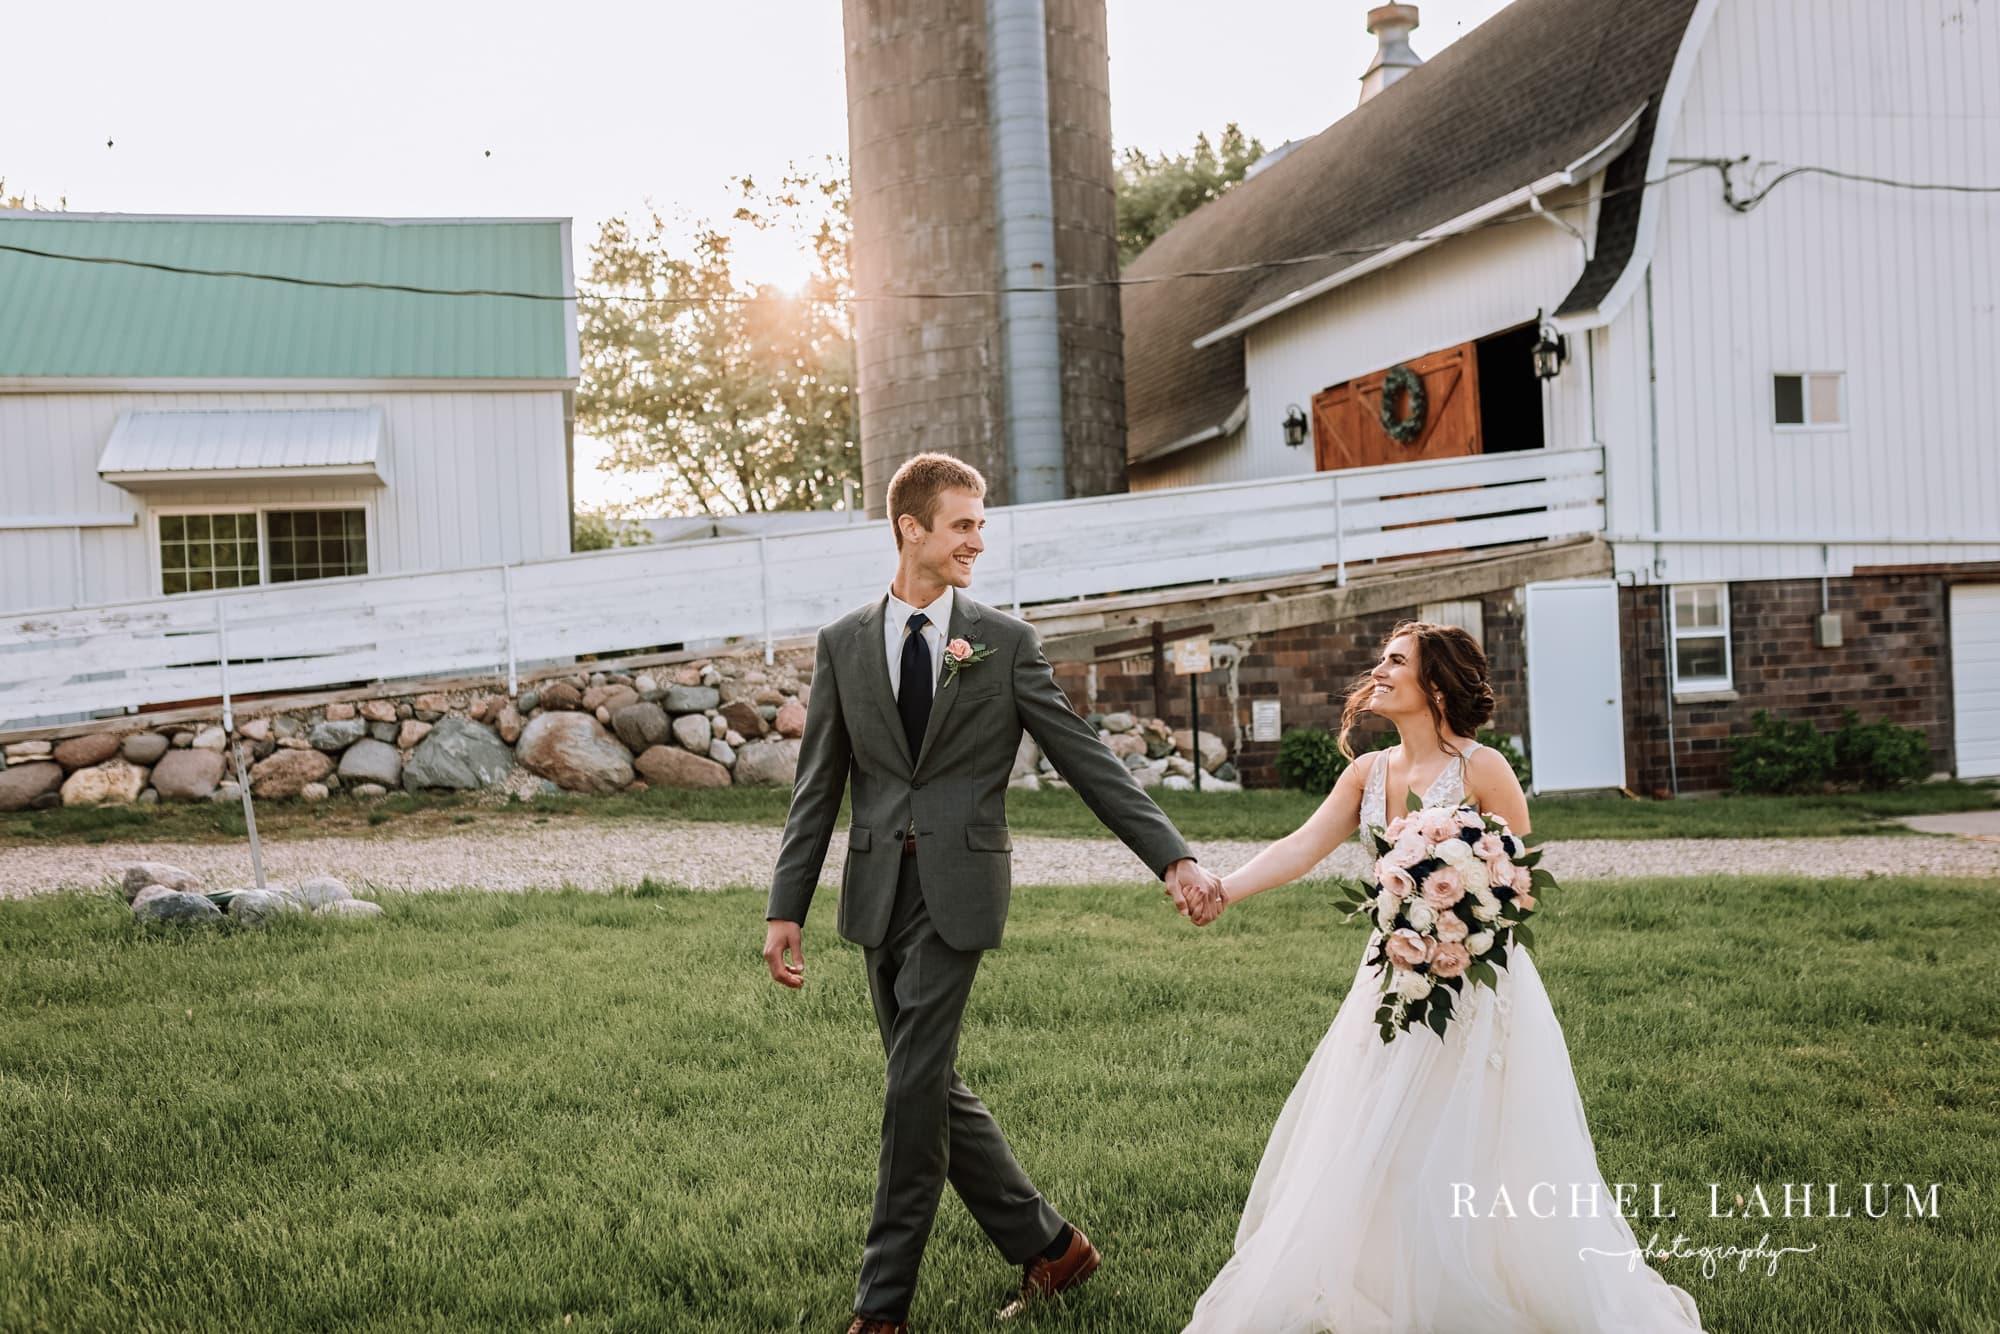 Groom walks hand-in-hand with bride at Glencoe, MN, wedding.